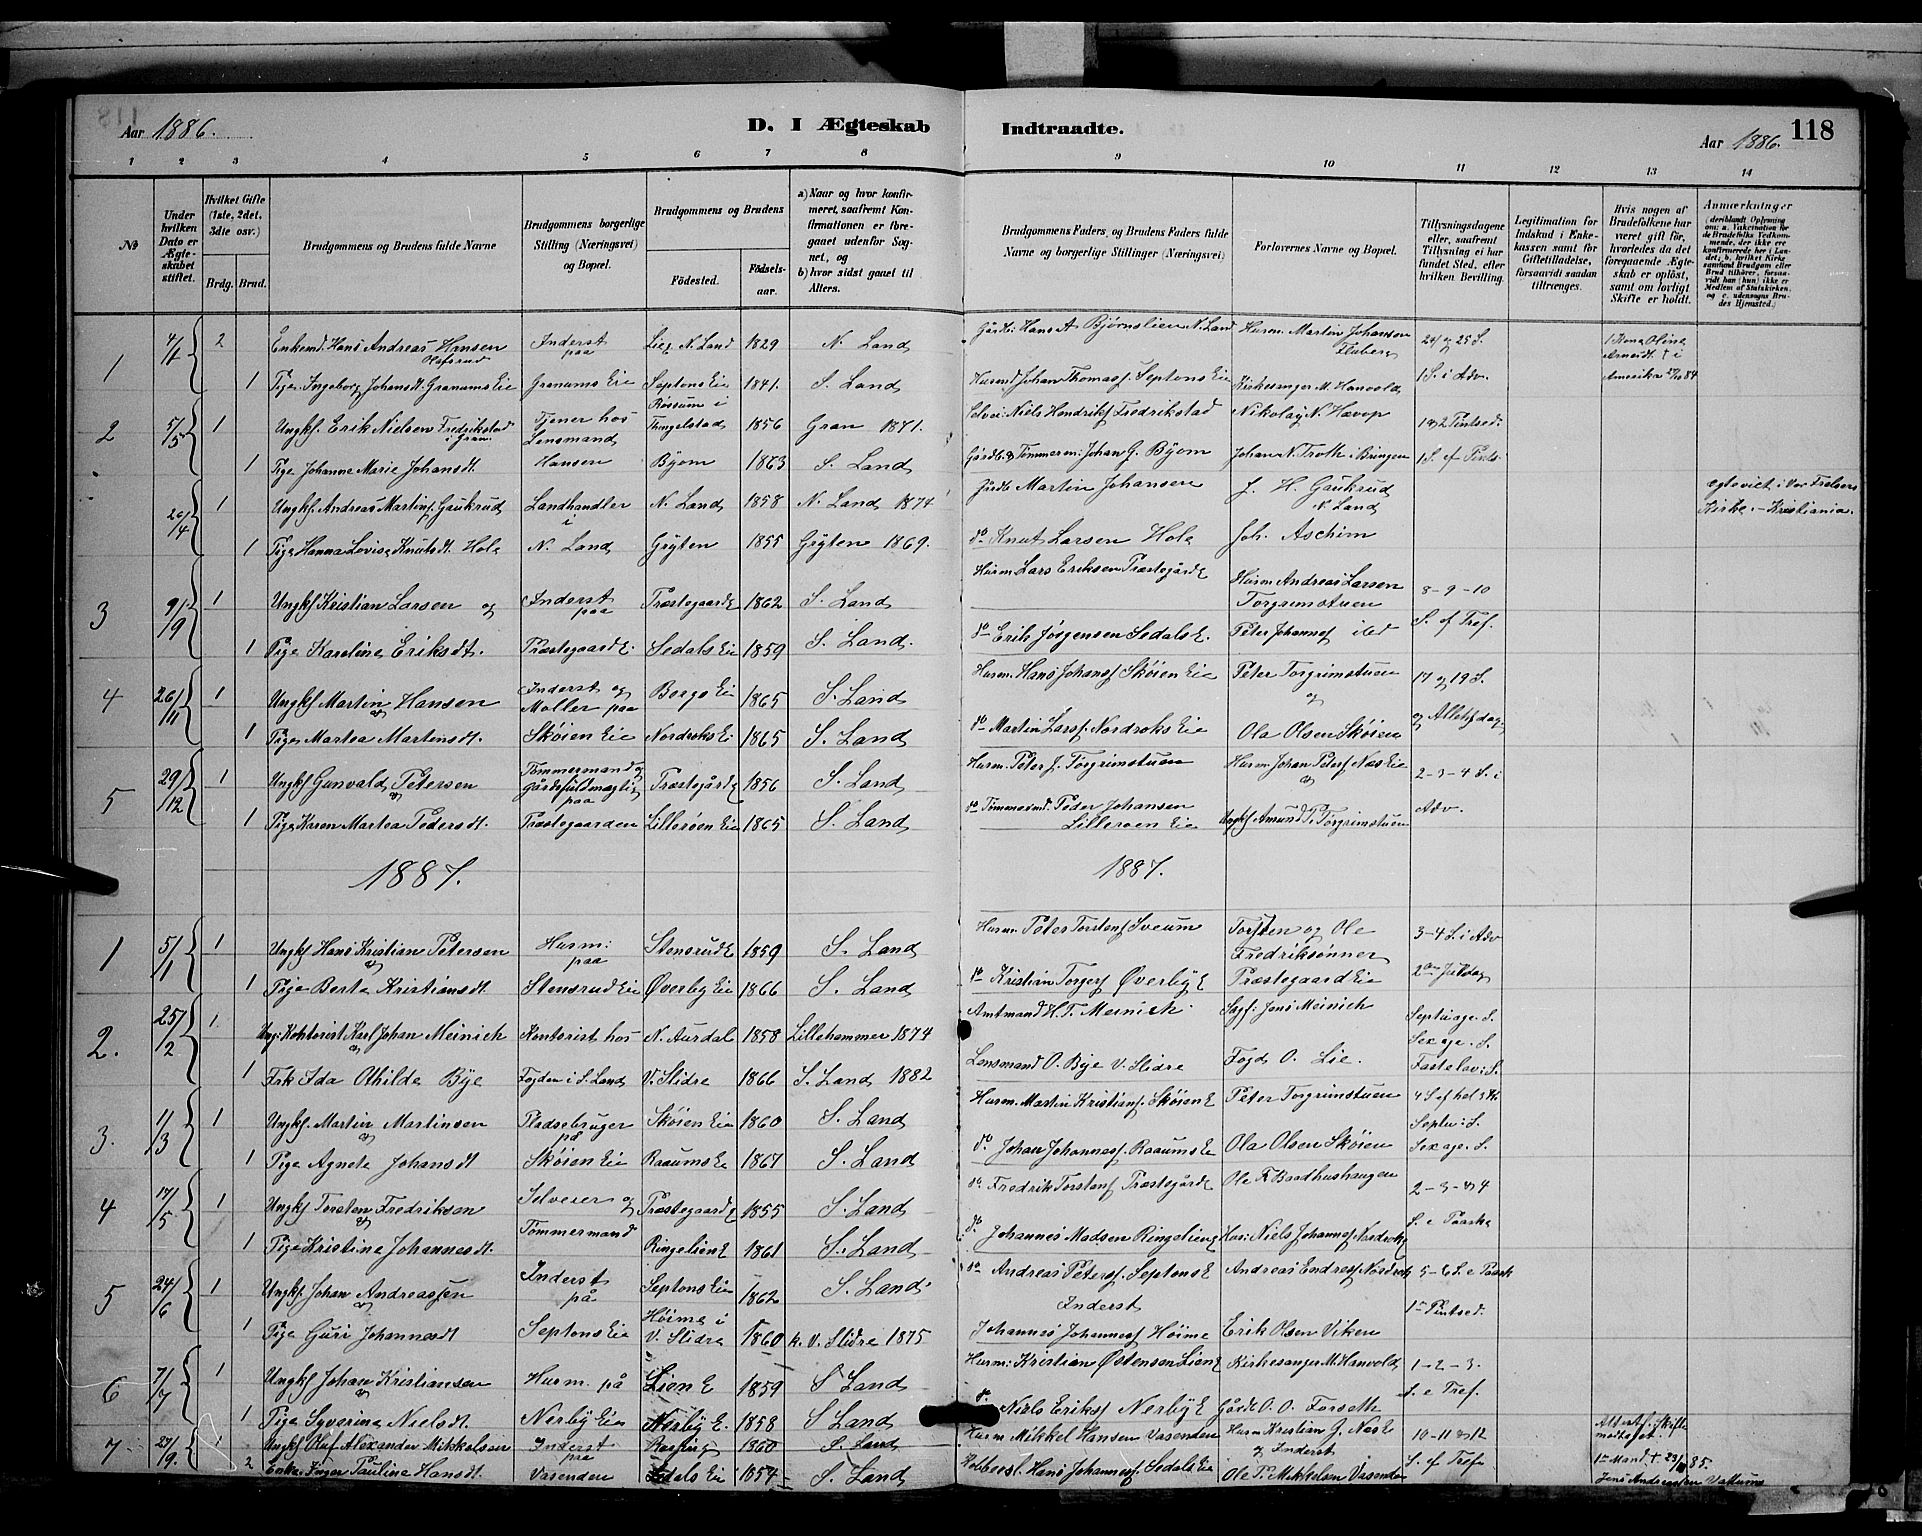 SAH, Søndre Land prestekontor, L/L0003: Klokkerbok nr. 3, 1884-1902, s. 118